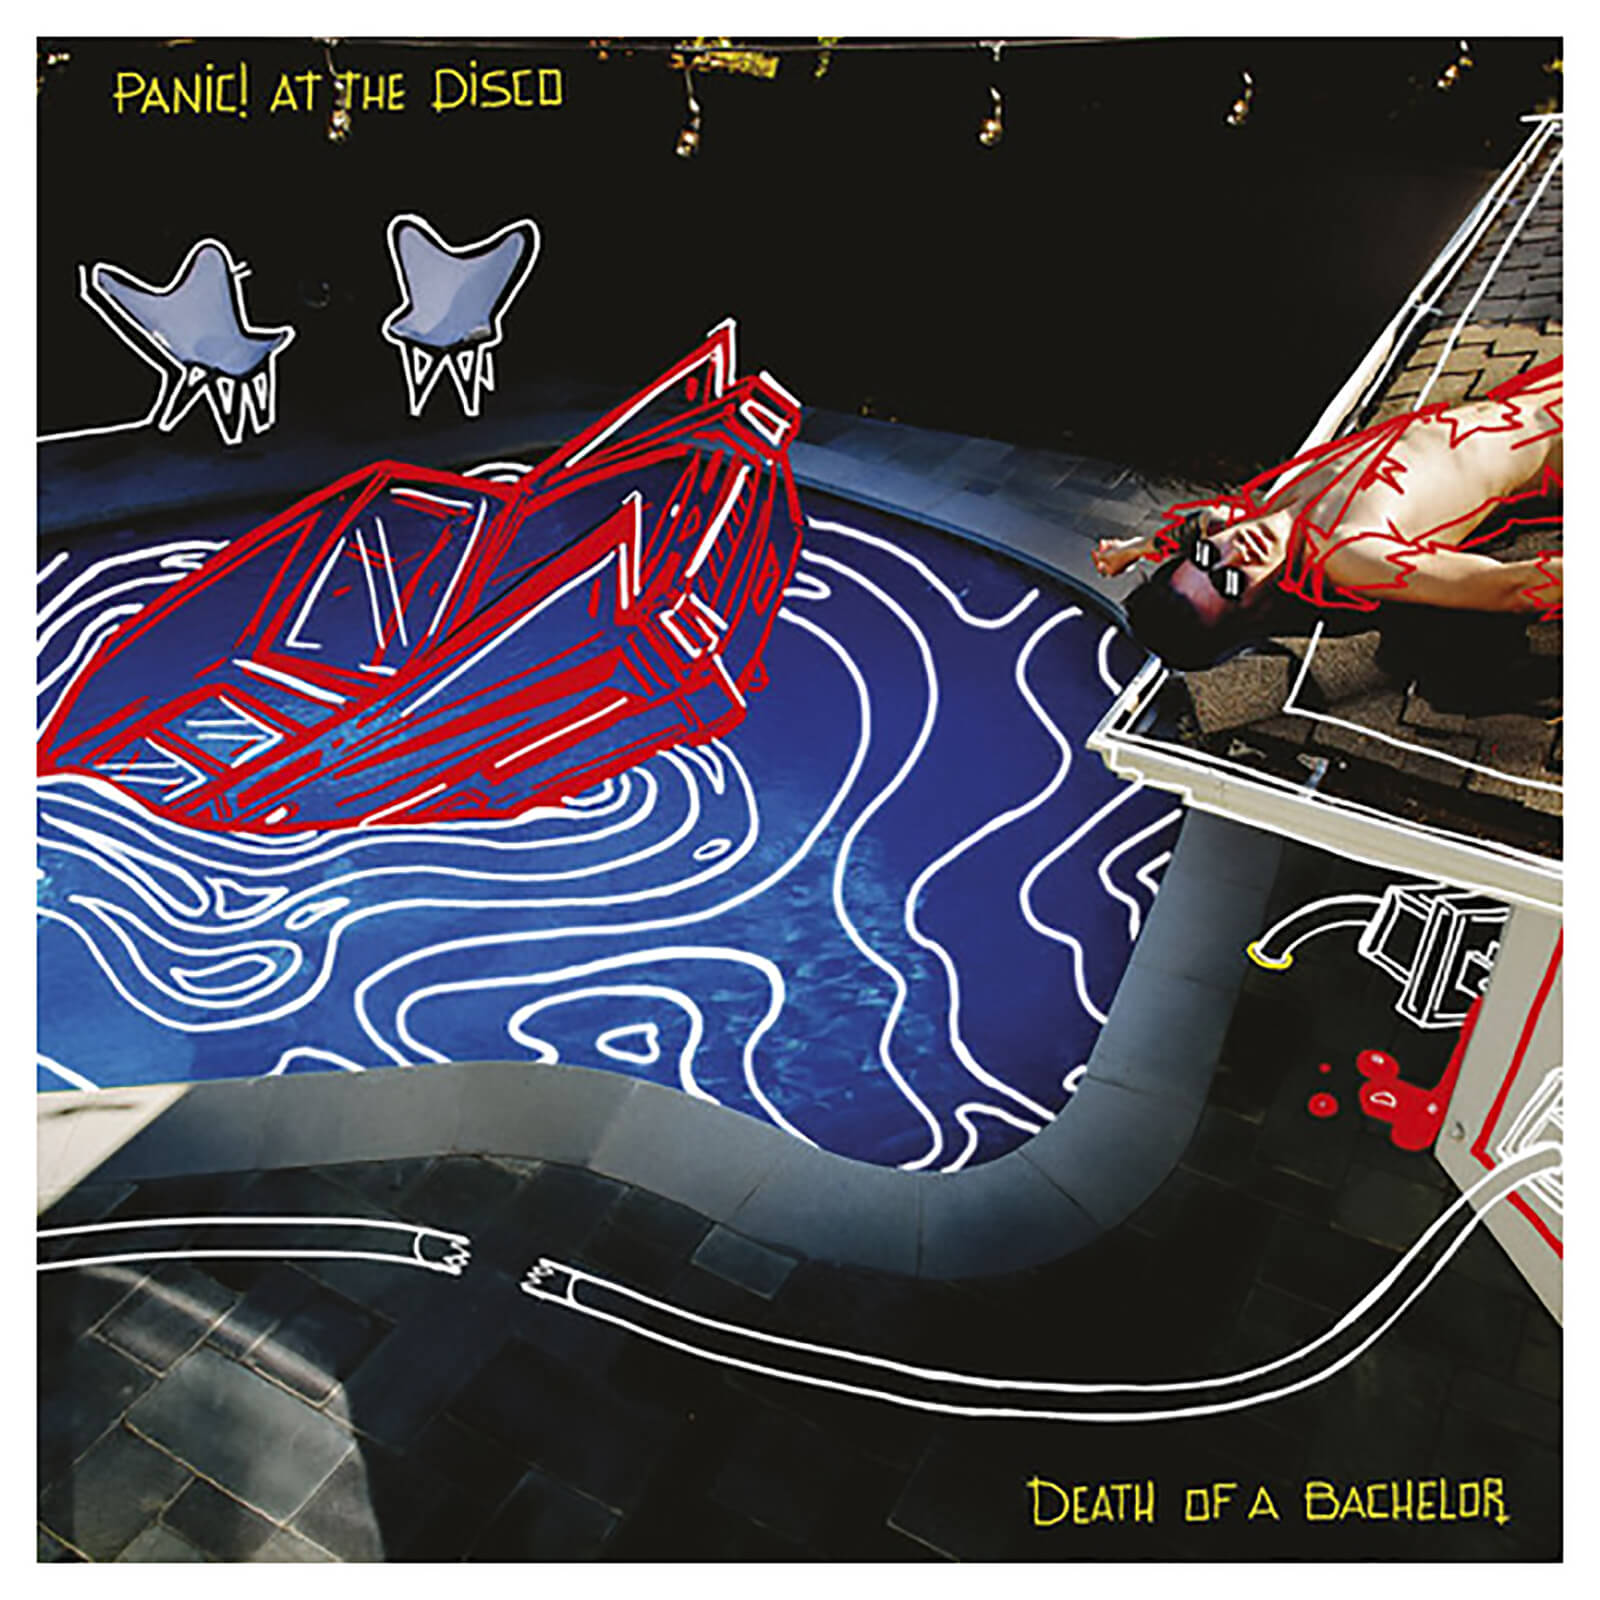 9f366ca1 Panic At The Disco - Death Of A Bachelor - Vinyl Merchandise | Zavvi US